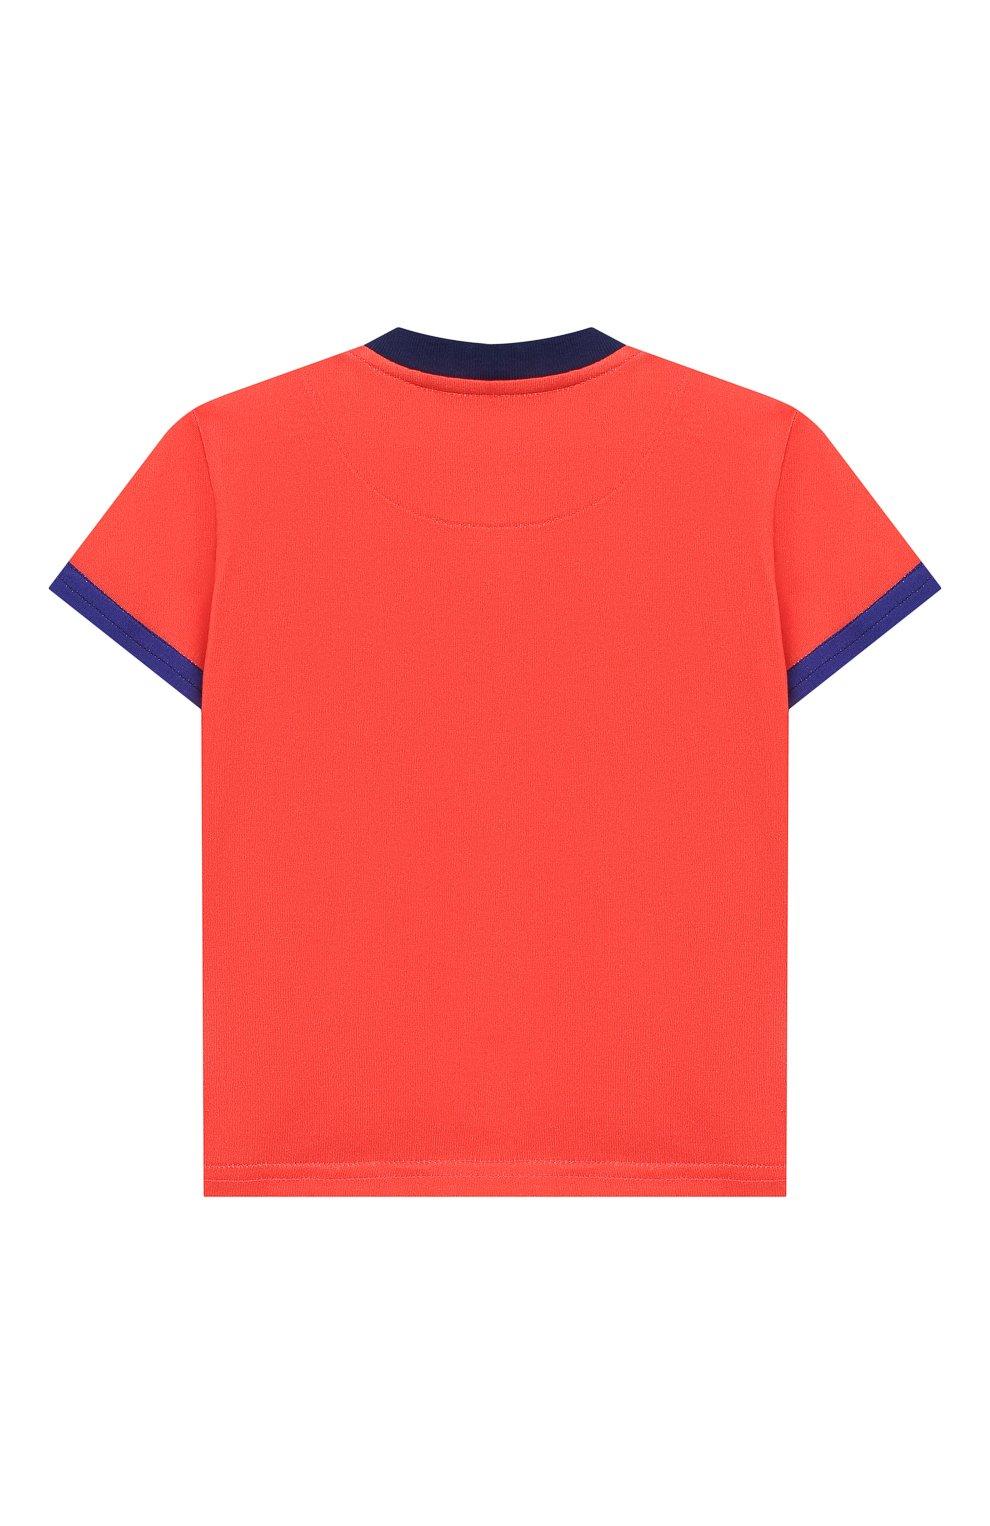 Детский хлопковая футболка DOLCE & GABBANA красного цвета, арт. L1JT8E/G7SEZ | Фото 2 (Рукава: Короткие; Материал внешний: Хлопок; Статус проверки: Проверено)